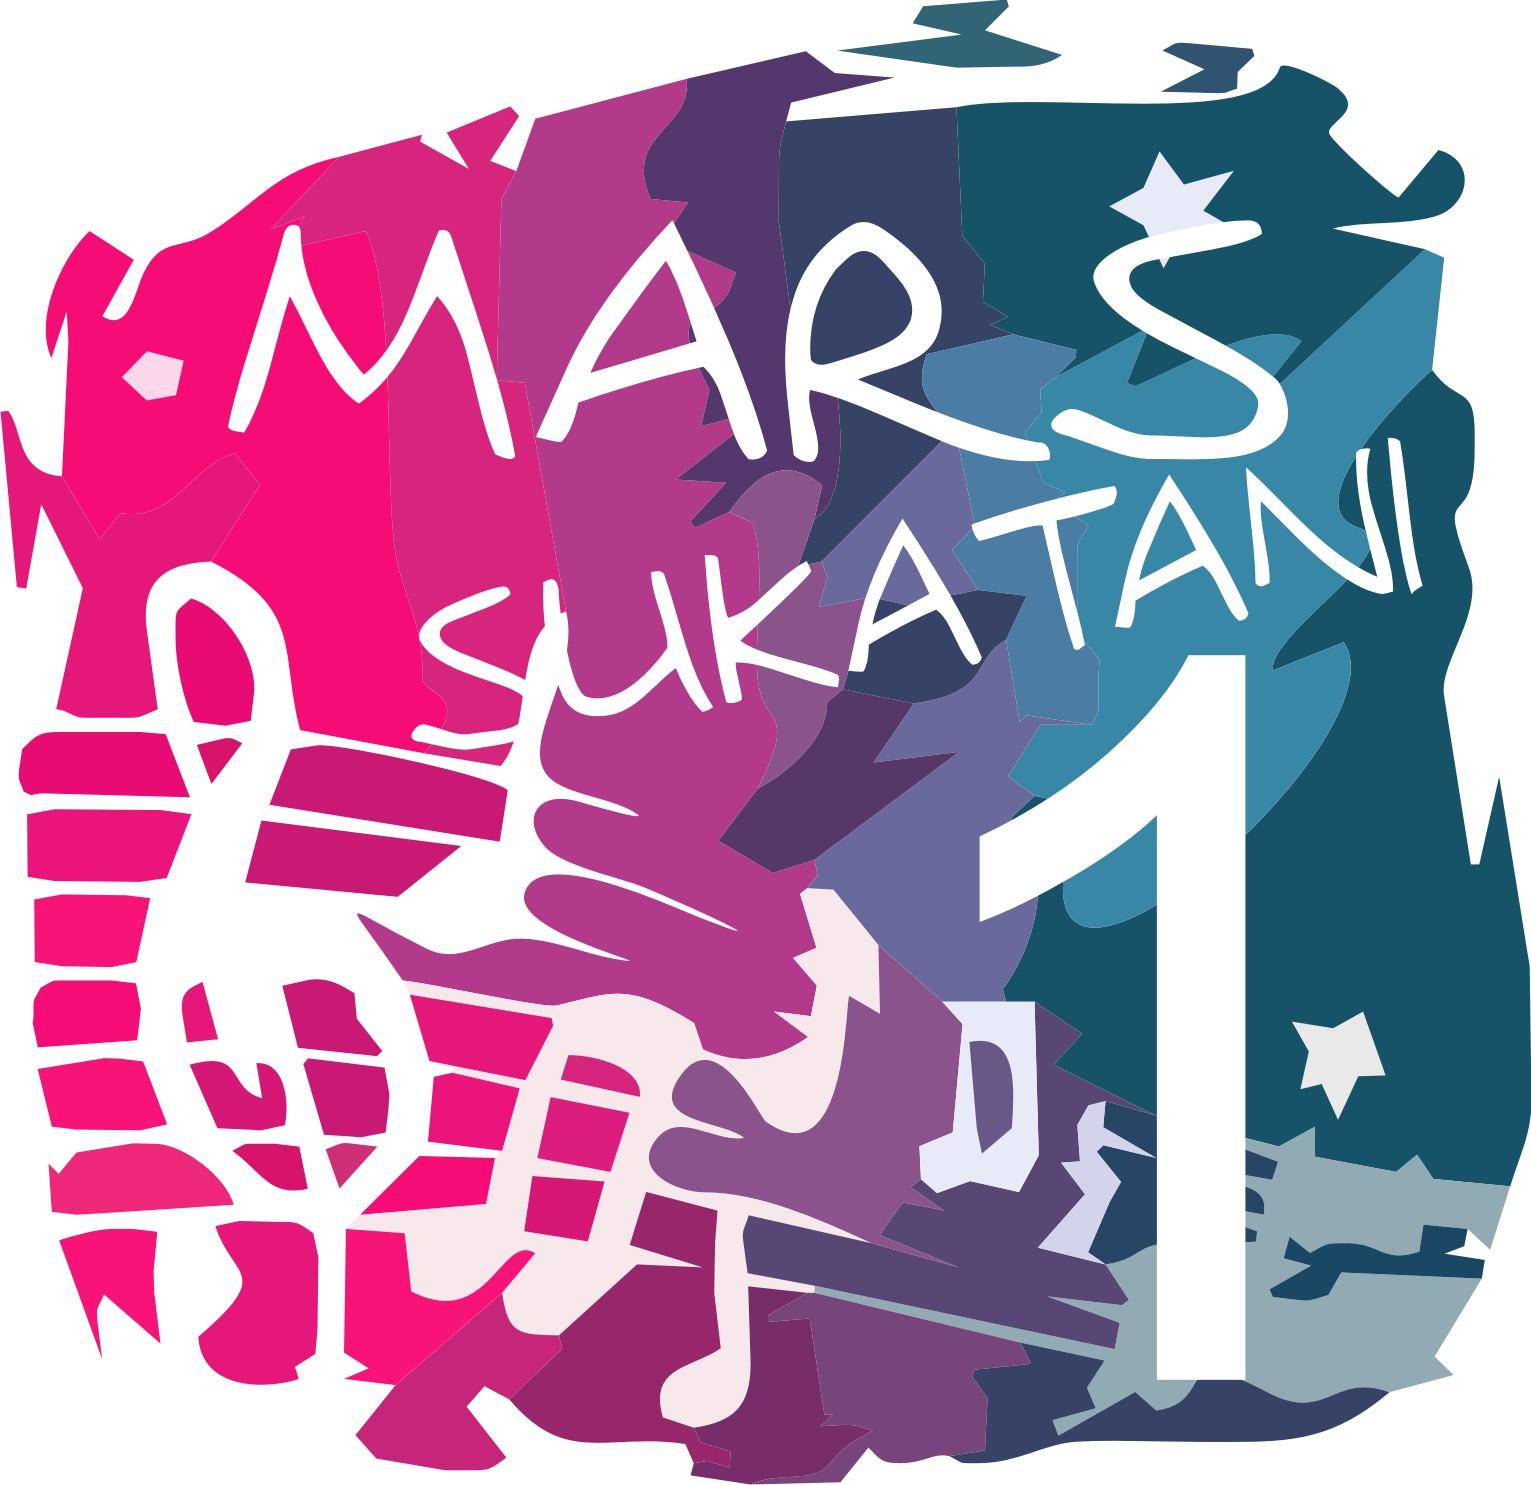 Download Lagu 4 20 Kita Pasti Tua: Download Lagu Mars SMA Negeri 1 Sukatani Dan Lirik